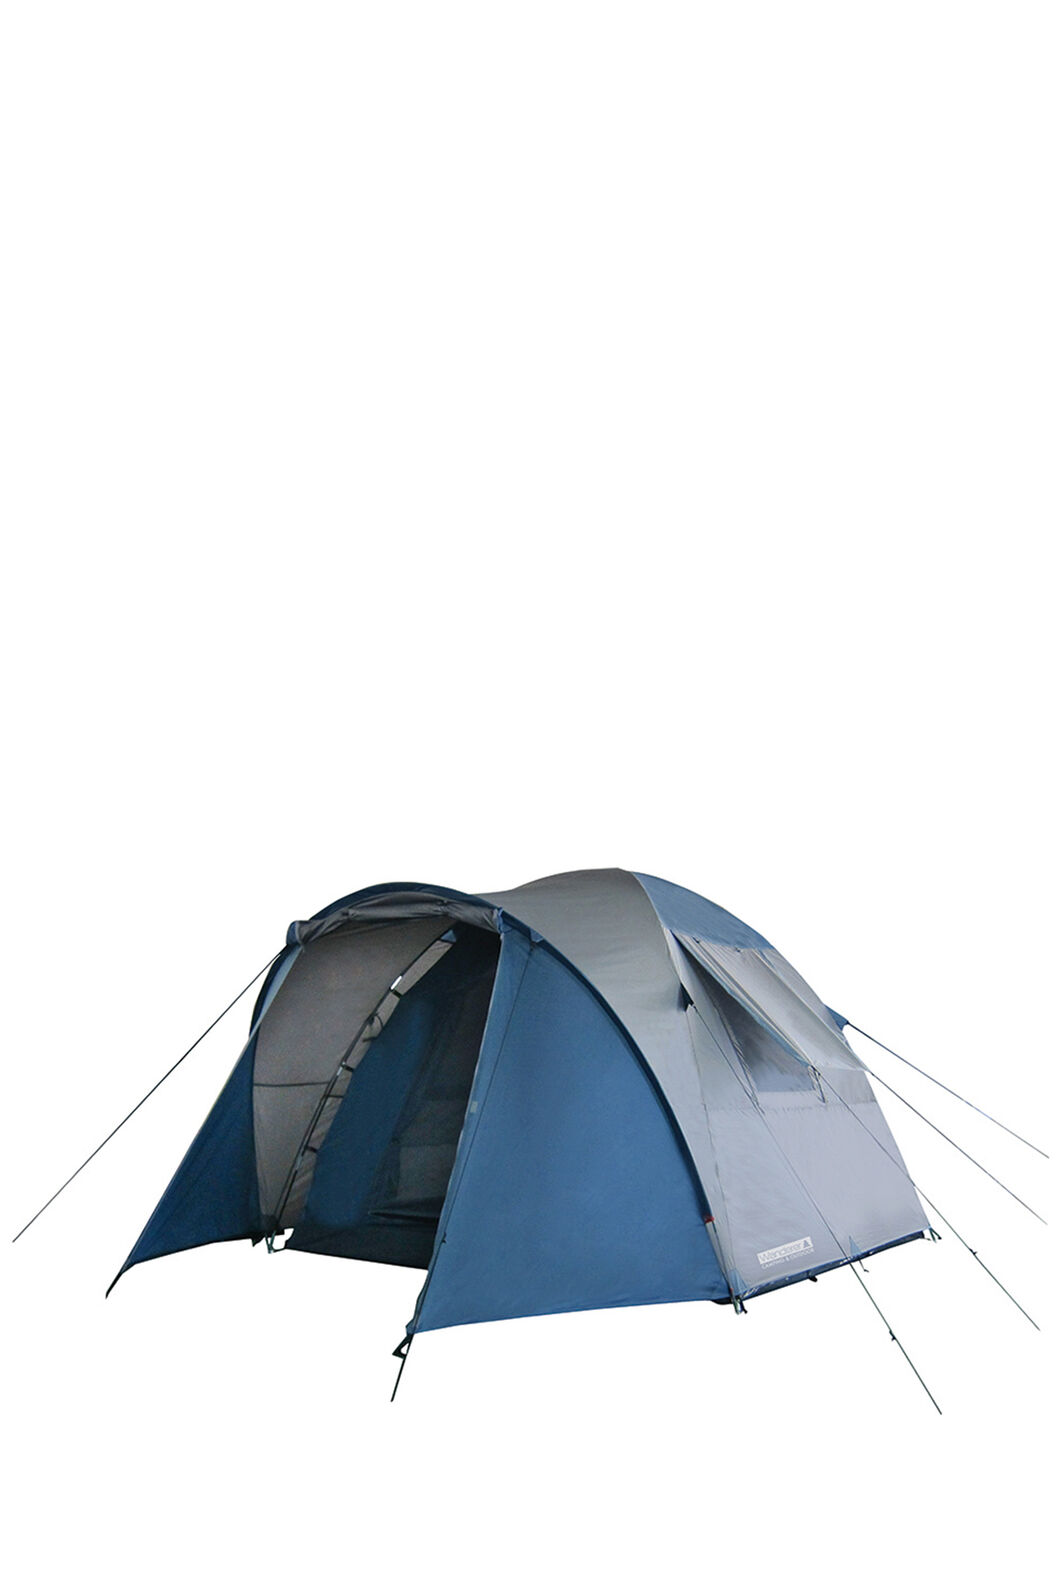 Wanderer Magnitude 4V 4 Person Dome Tent, None, hi-res